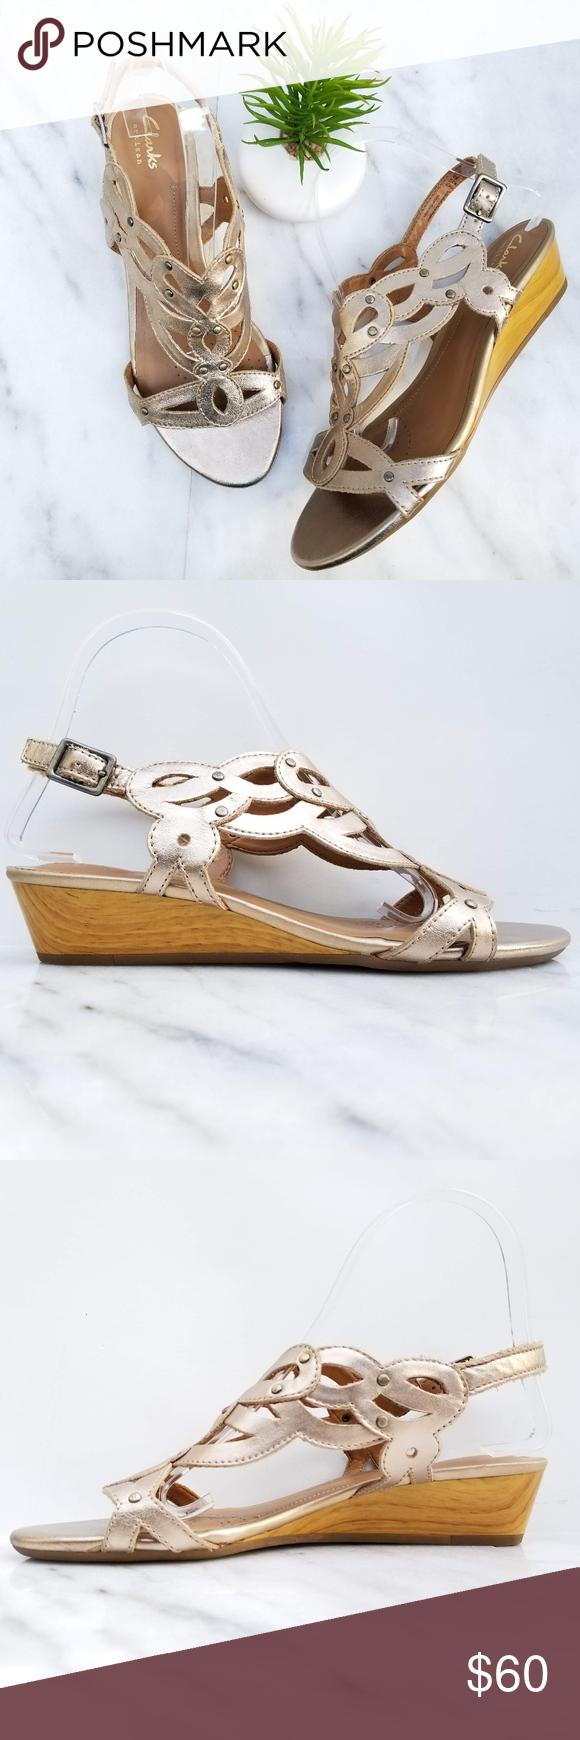 d8386797f84 Clarks Playful Tunes Wedge Sandal Gold Slingback Clarks artisan Women s  Playful Tunes Sandal Lattice-effect